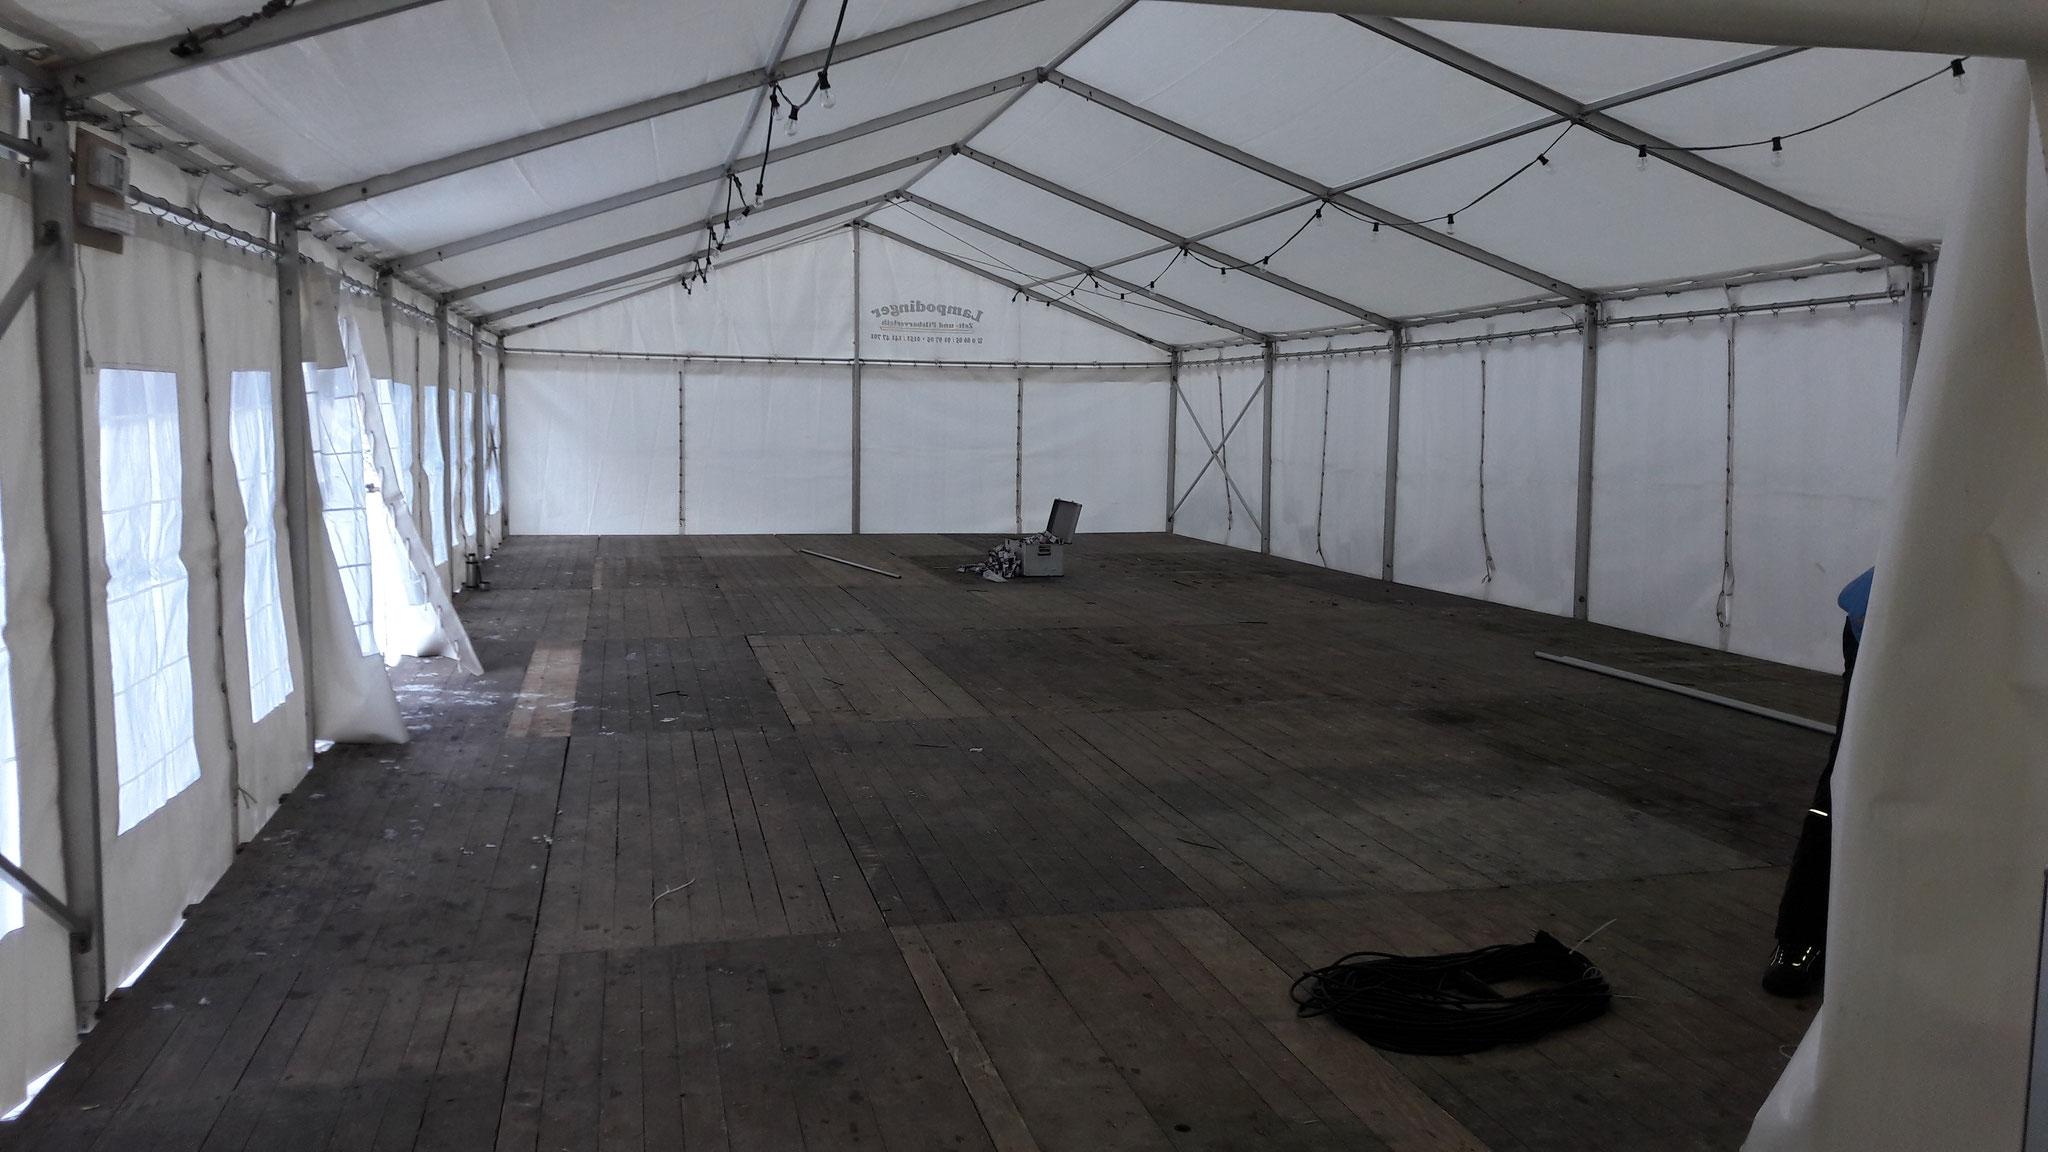 Das Zelt umfaasst bis zu 300 Personen.